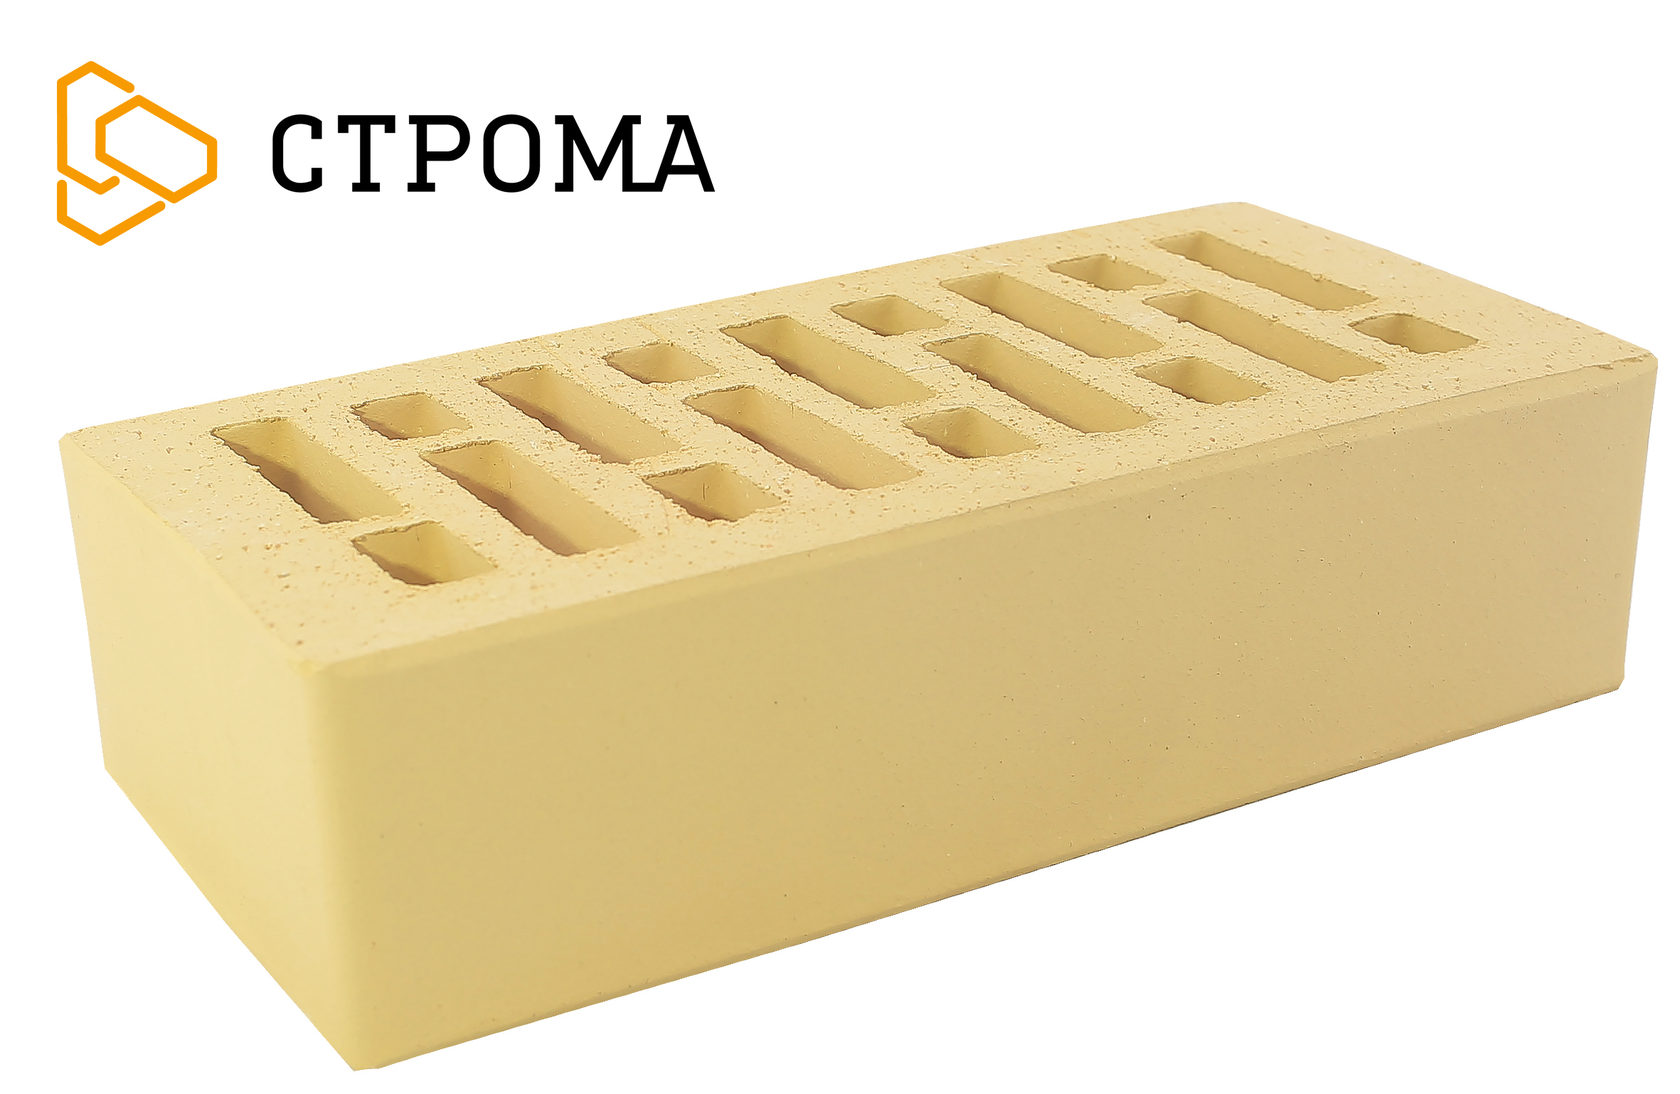 "Кирпич в Иркутске. ""Солома"" Строма"